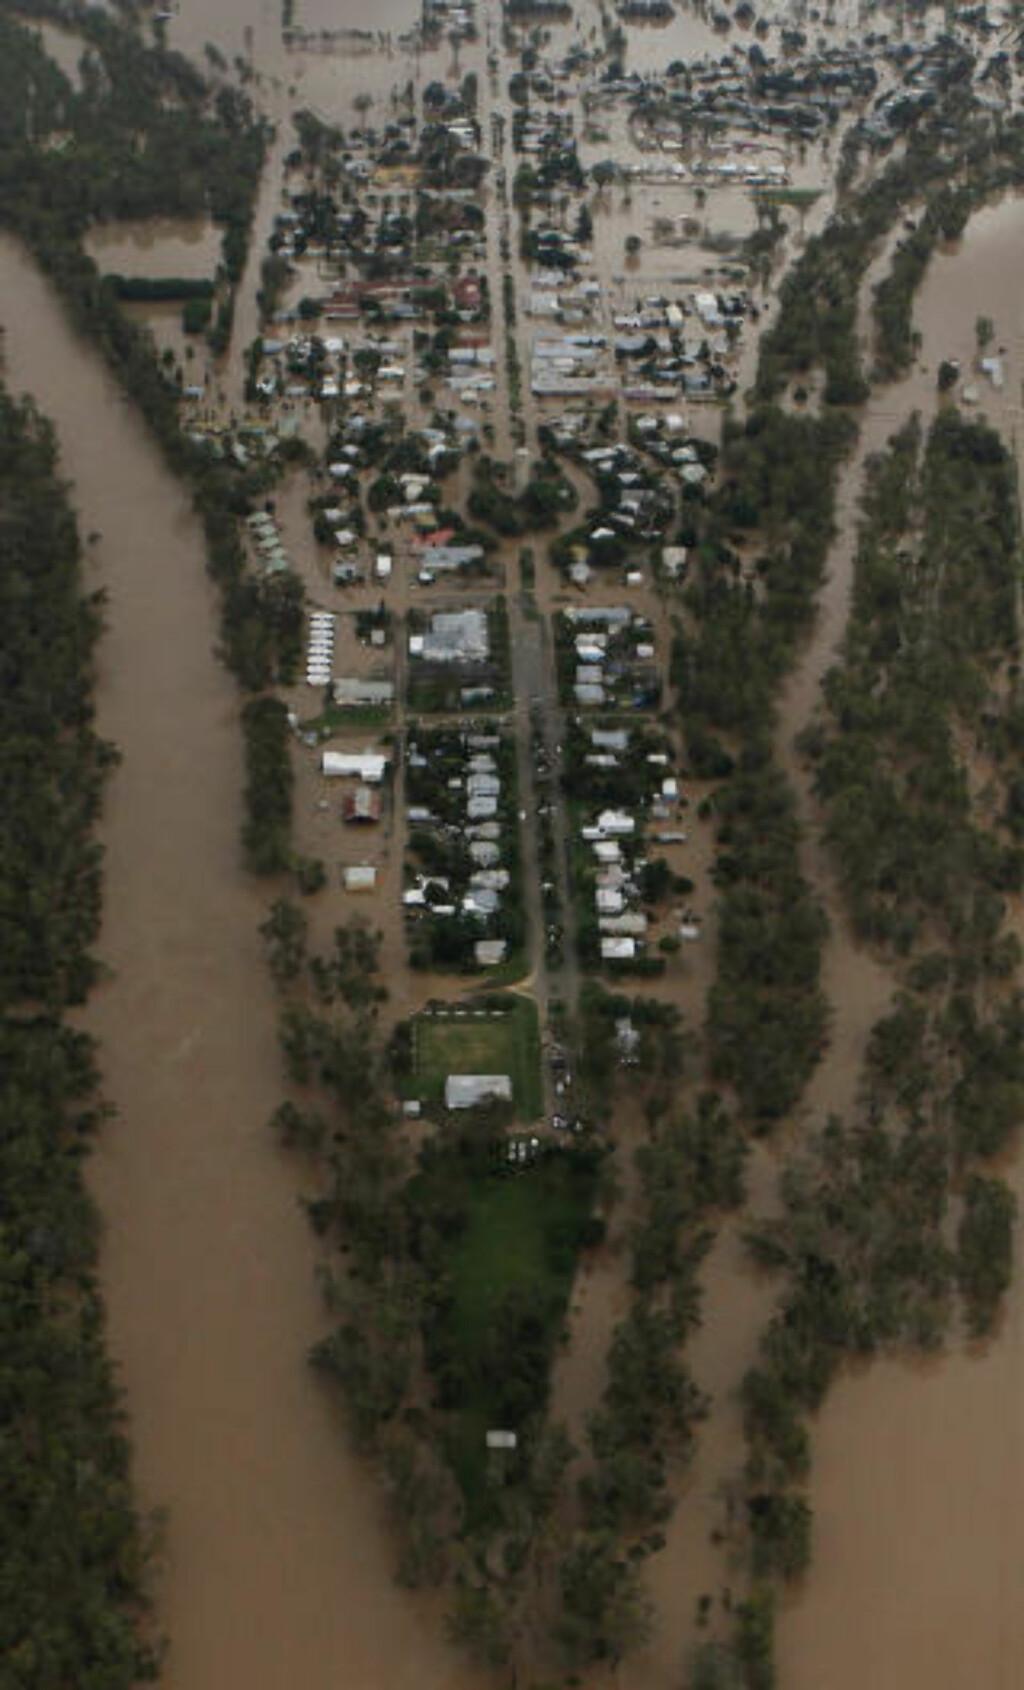 - BLANT DE VERSTE: Meteorologer hevder det aldri tidligere er notert større oversvømmelser i landets historie. Her er et flyfoto fra byen Theodore. Foto: REUTERS